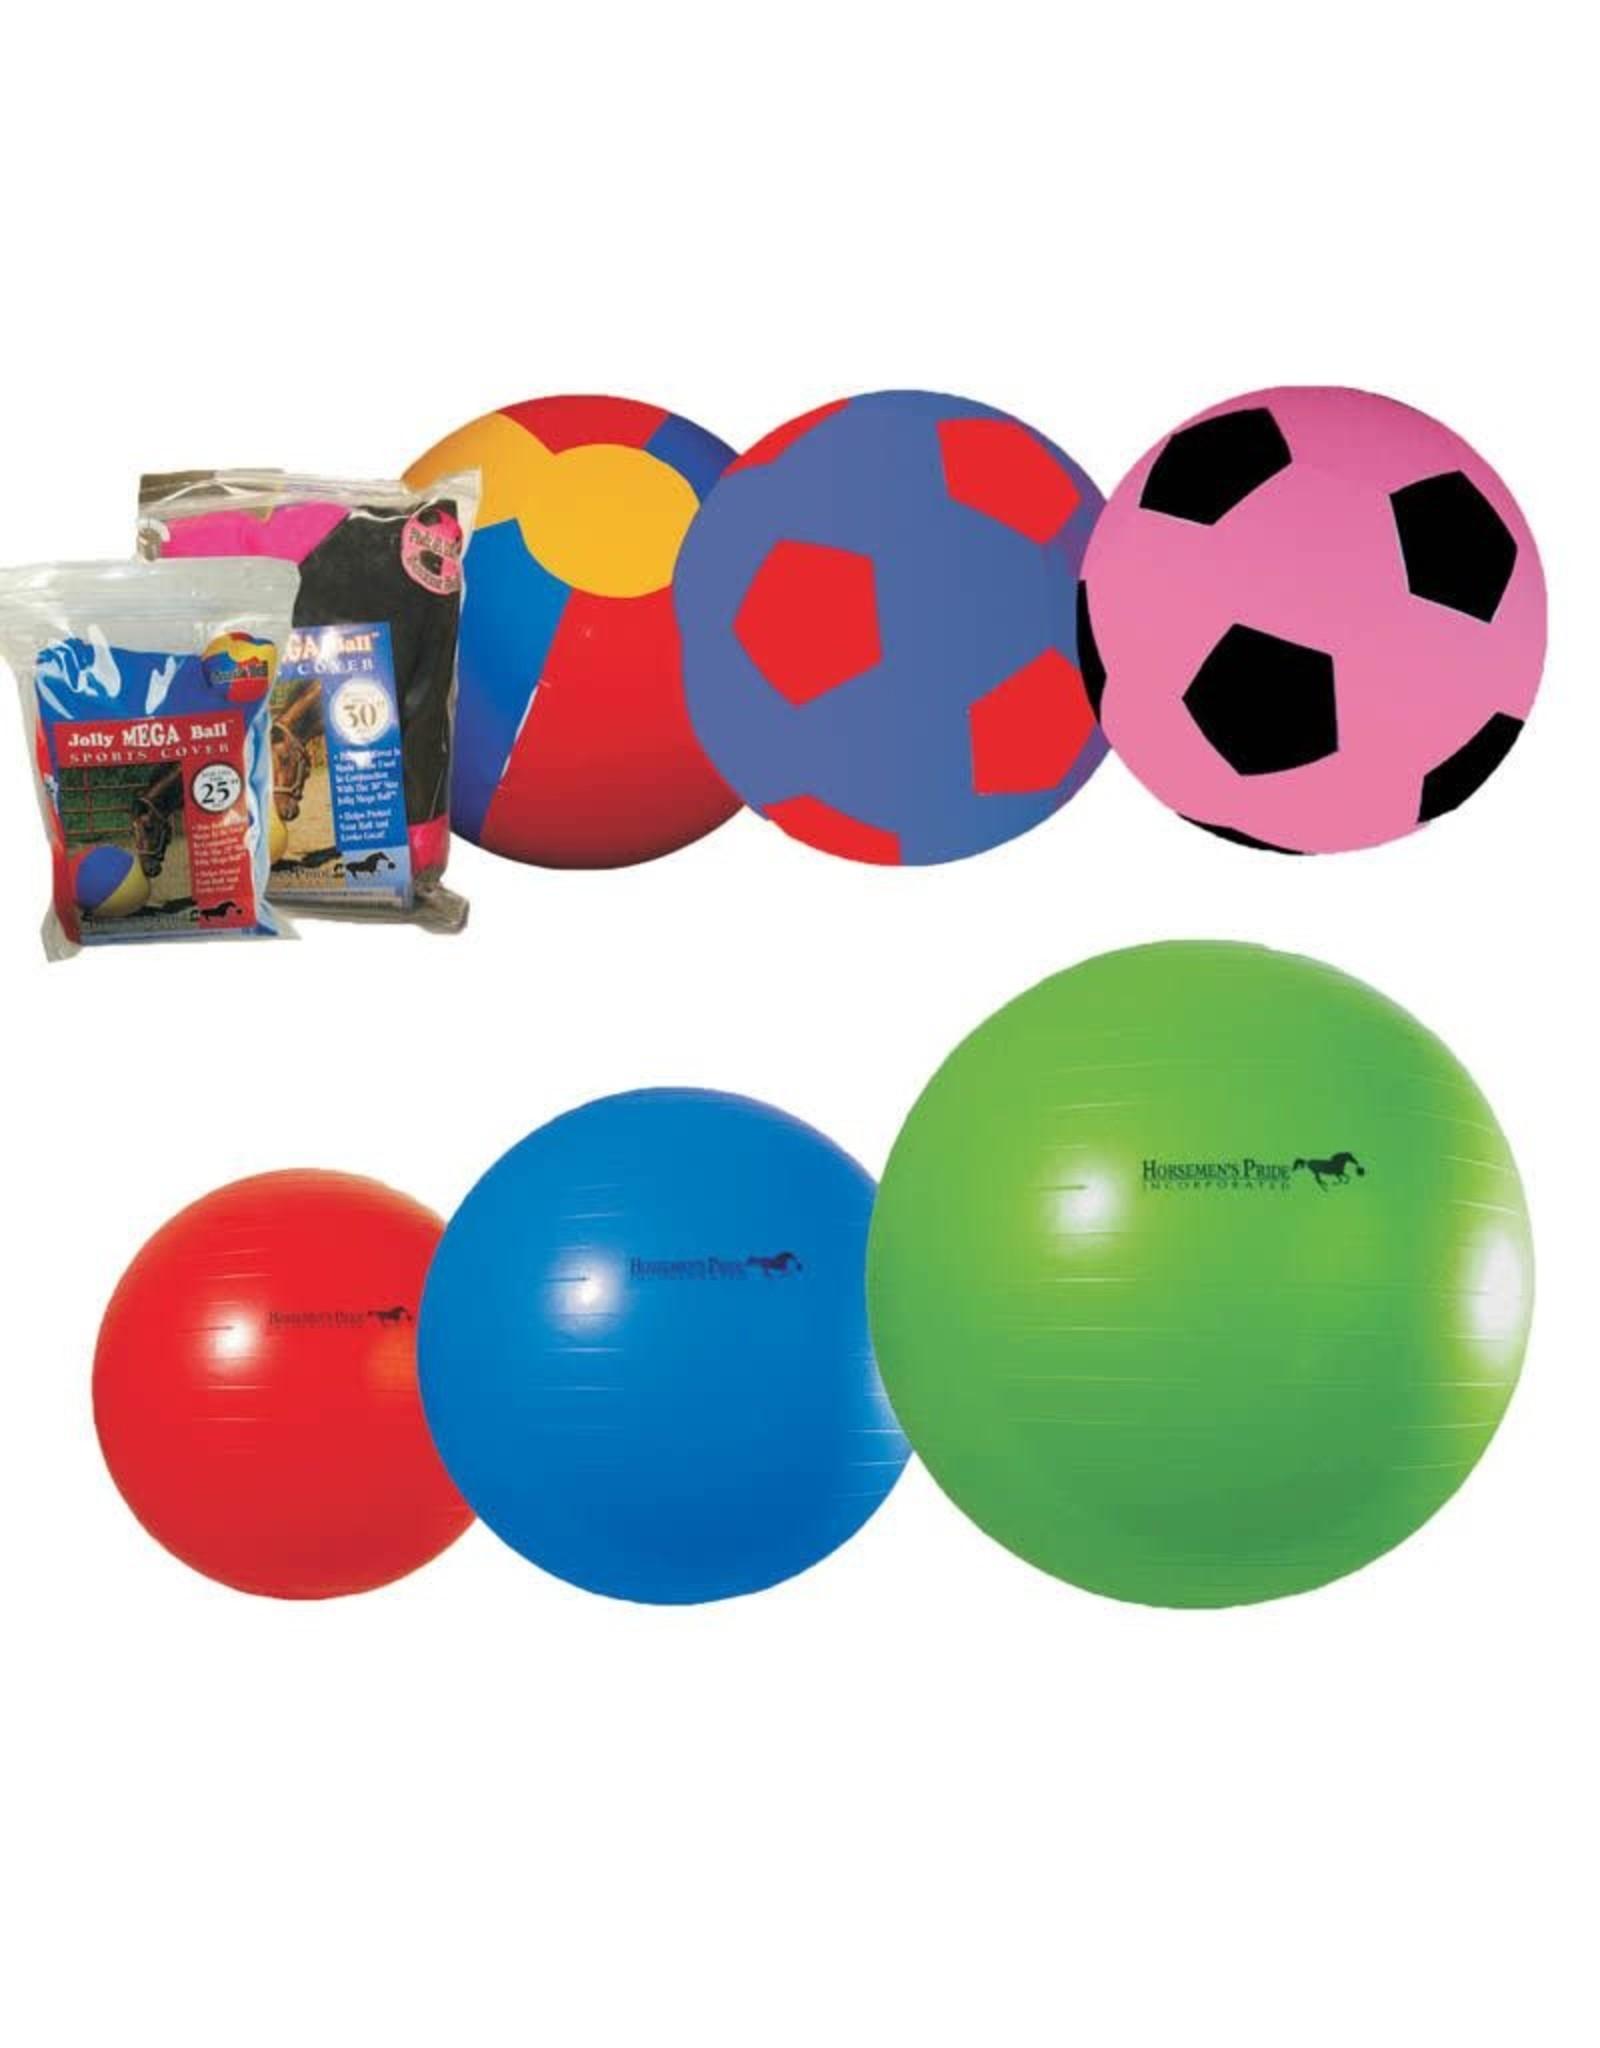 "Horseman's Pride Mega Ball 40"""